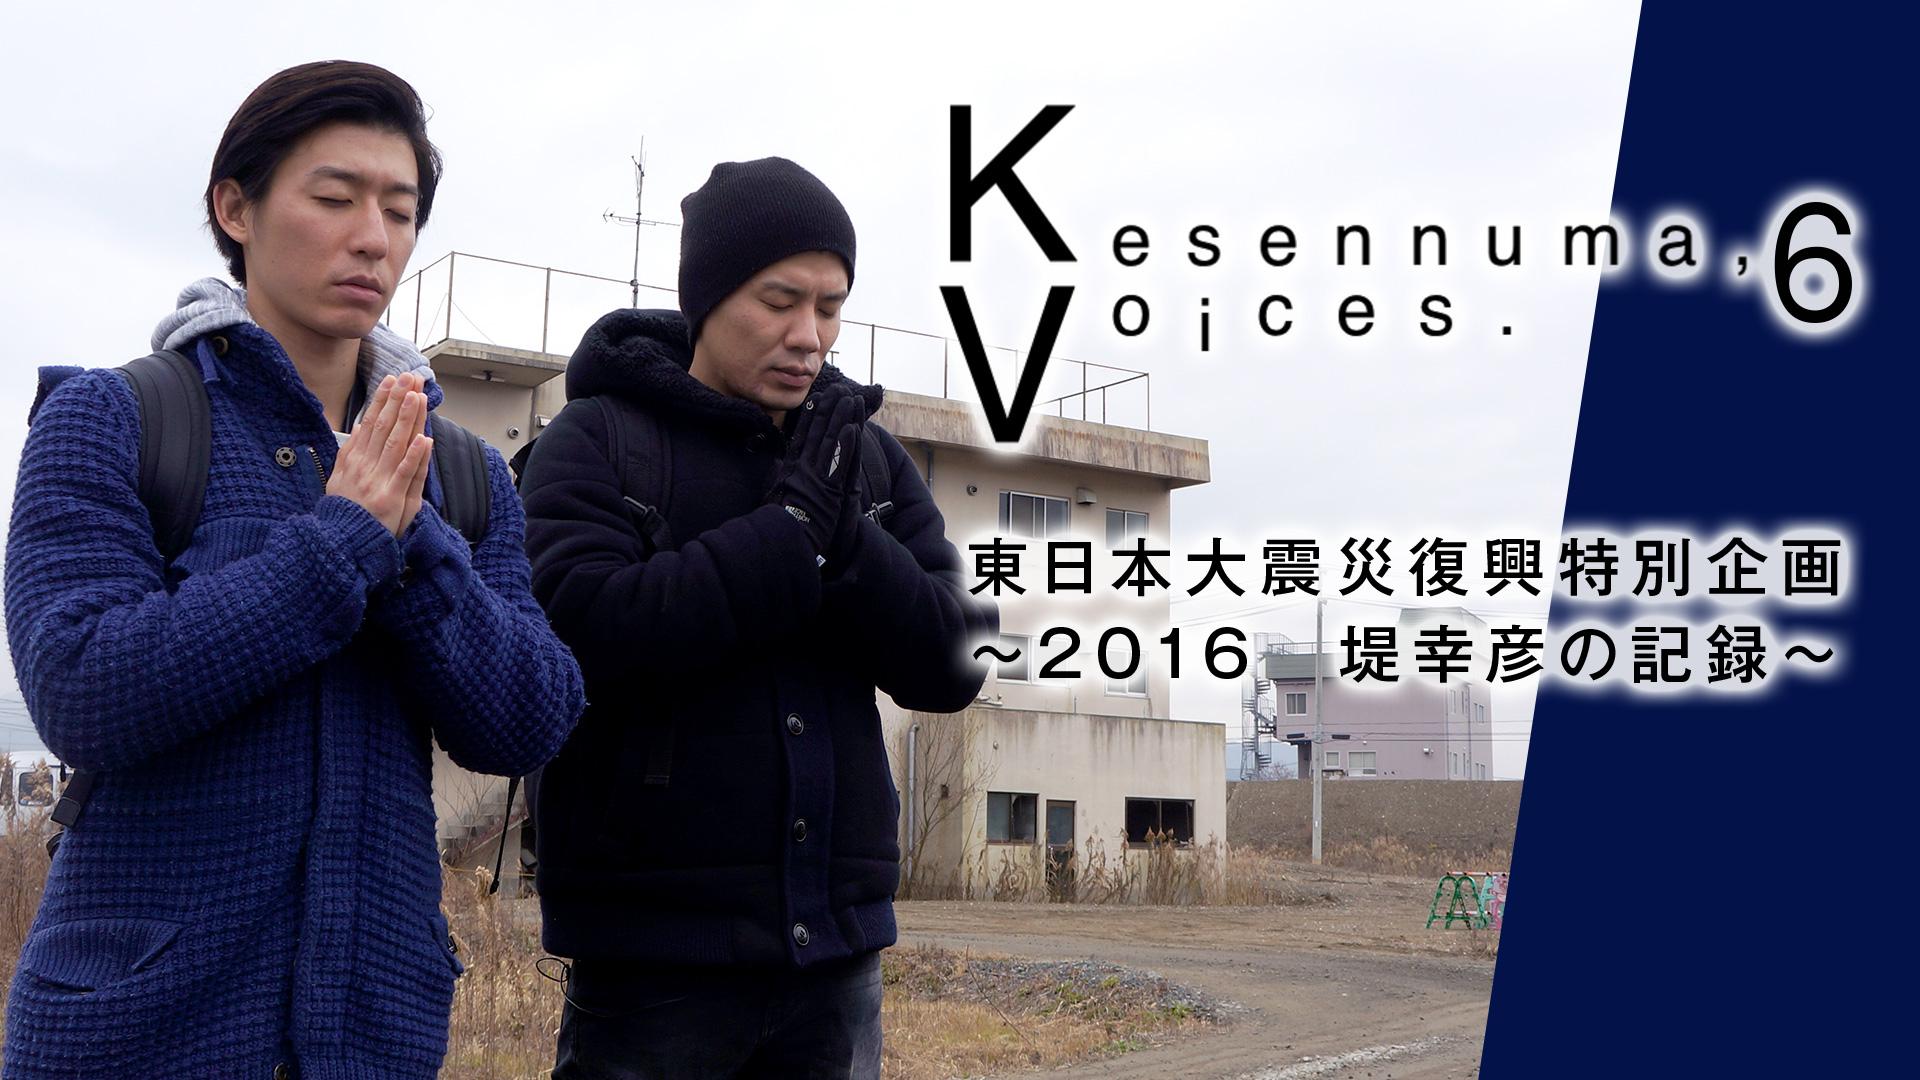 Kesennuma,Voices.6 東日本大震災復興特別企画~2016 堤幸彦の記録~の動画 - Kesennuma,Voices.7 東日本大震災復興特別企画~2017 堤幸彦の記録~